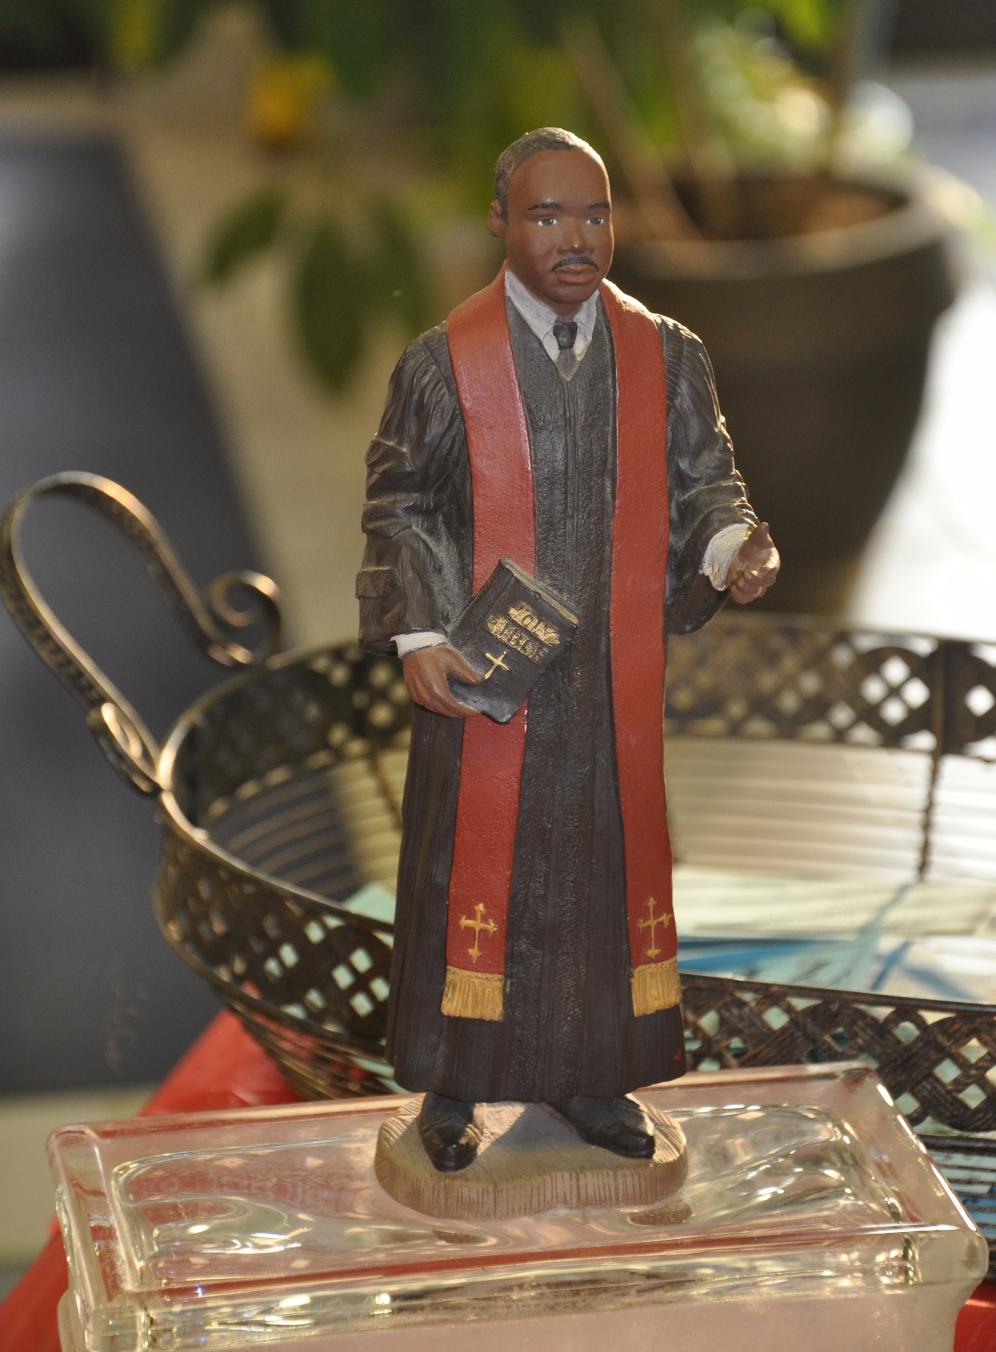 Our 7th Annual MLK Prayer Breakfast